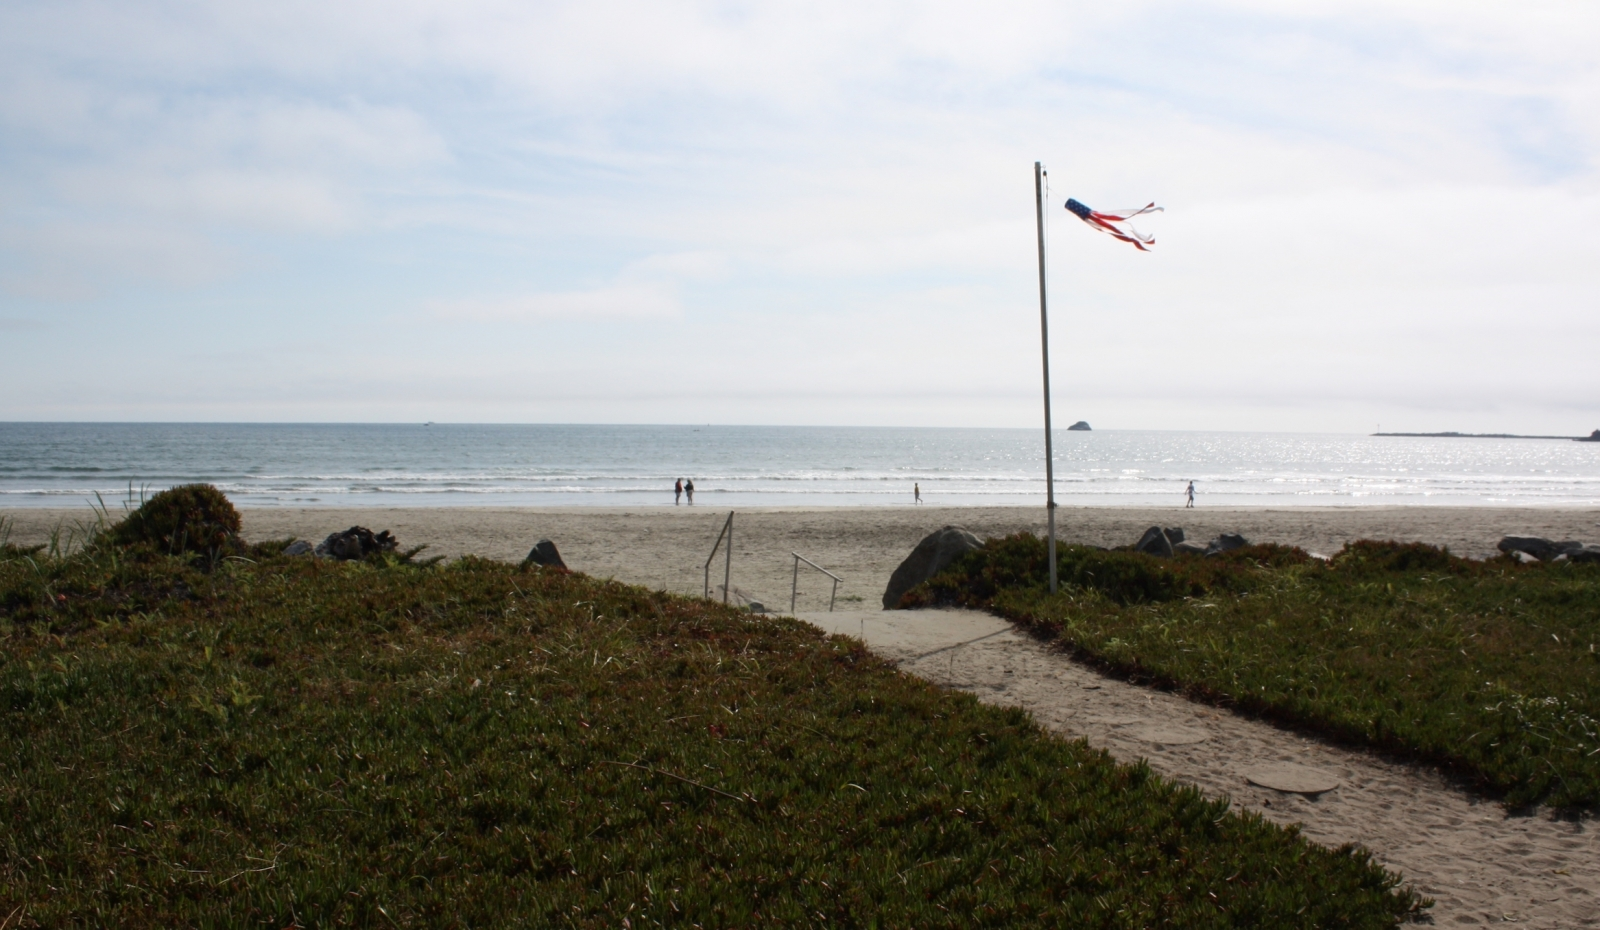 sandy walkway through grass to beach